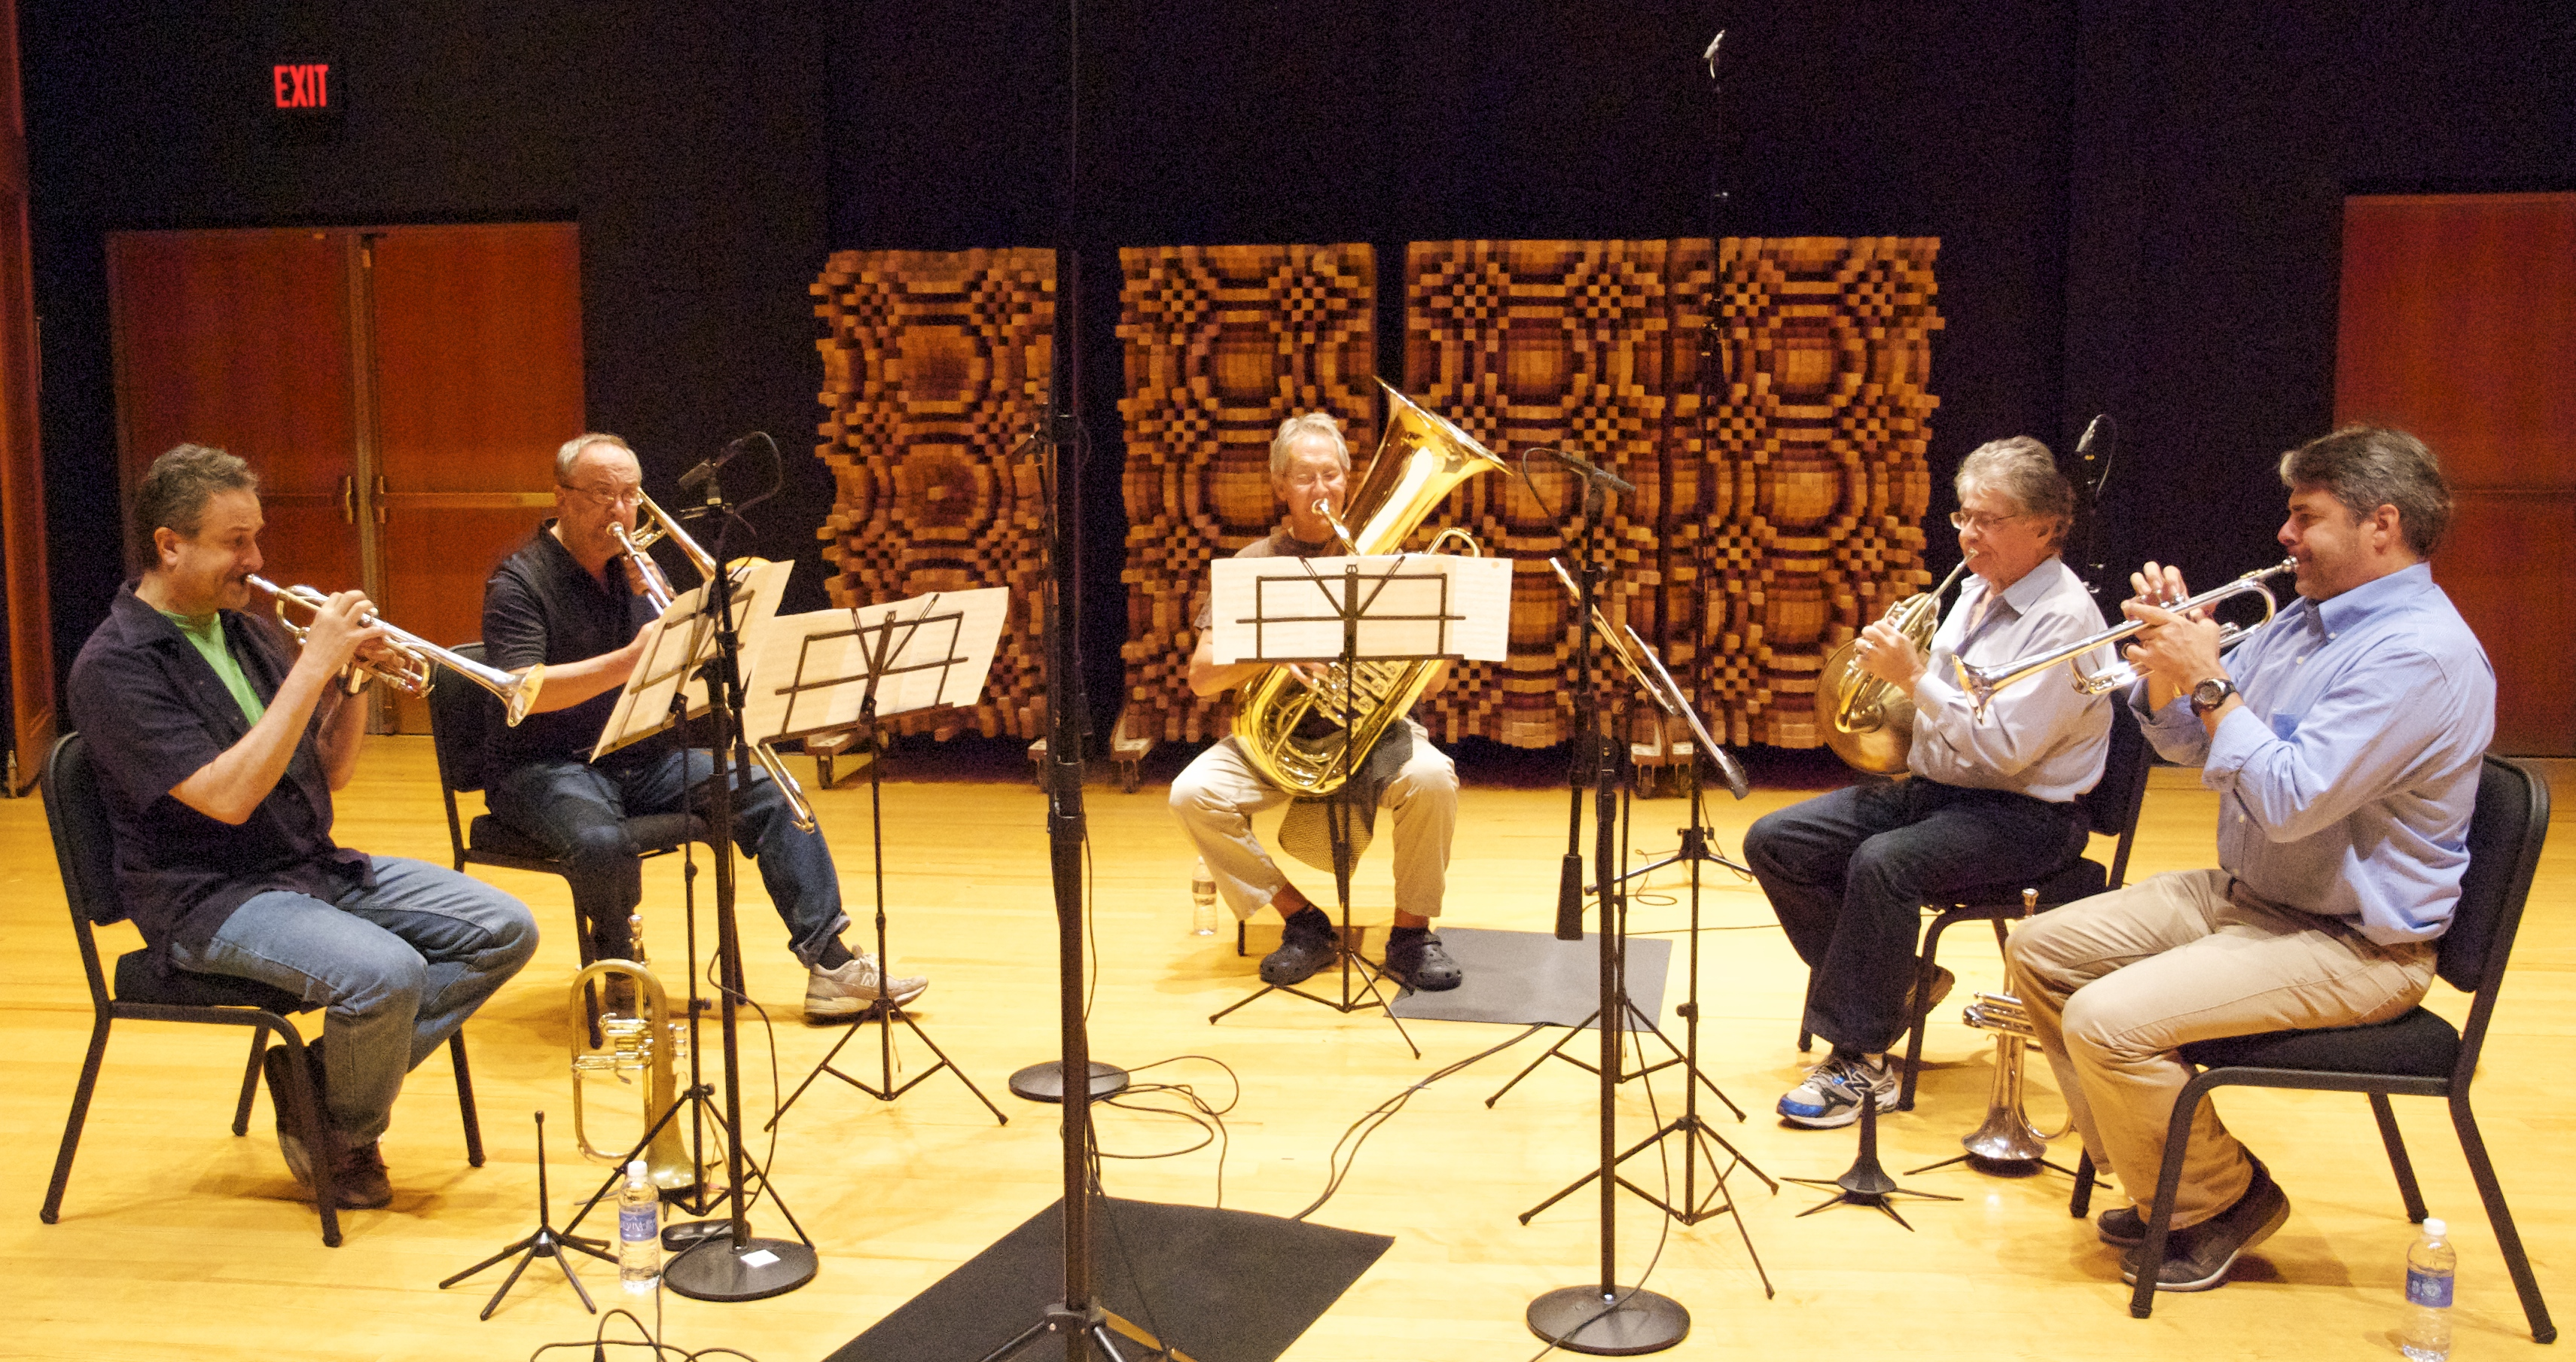 Dave Sampson recording session